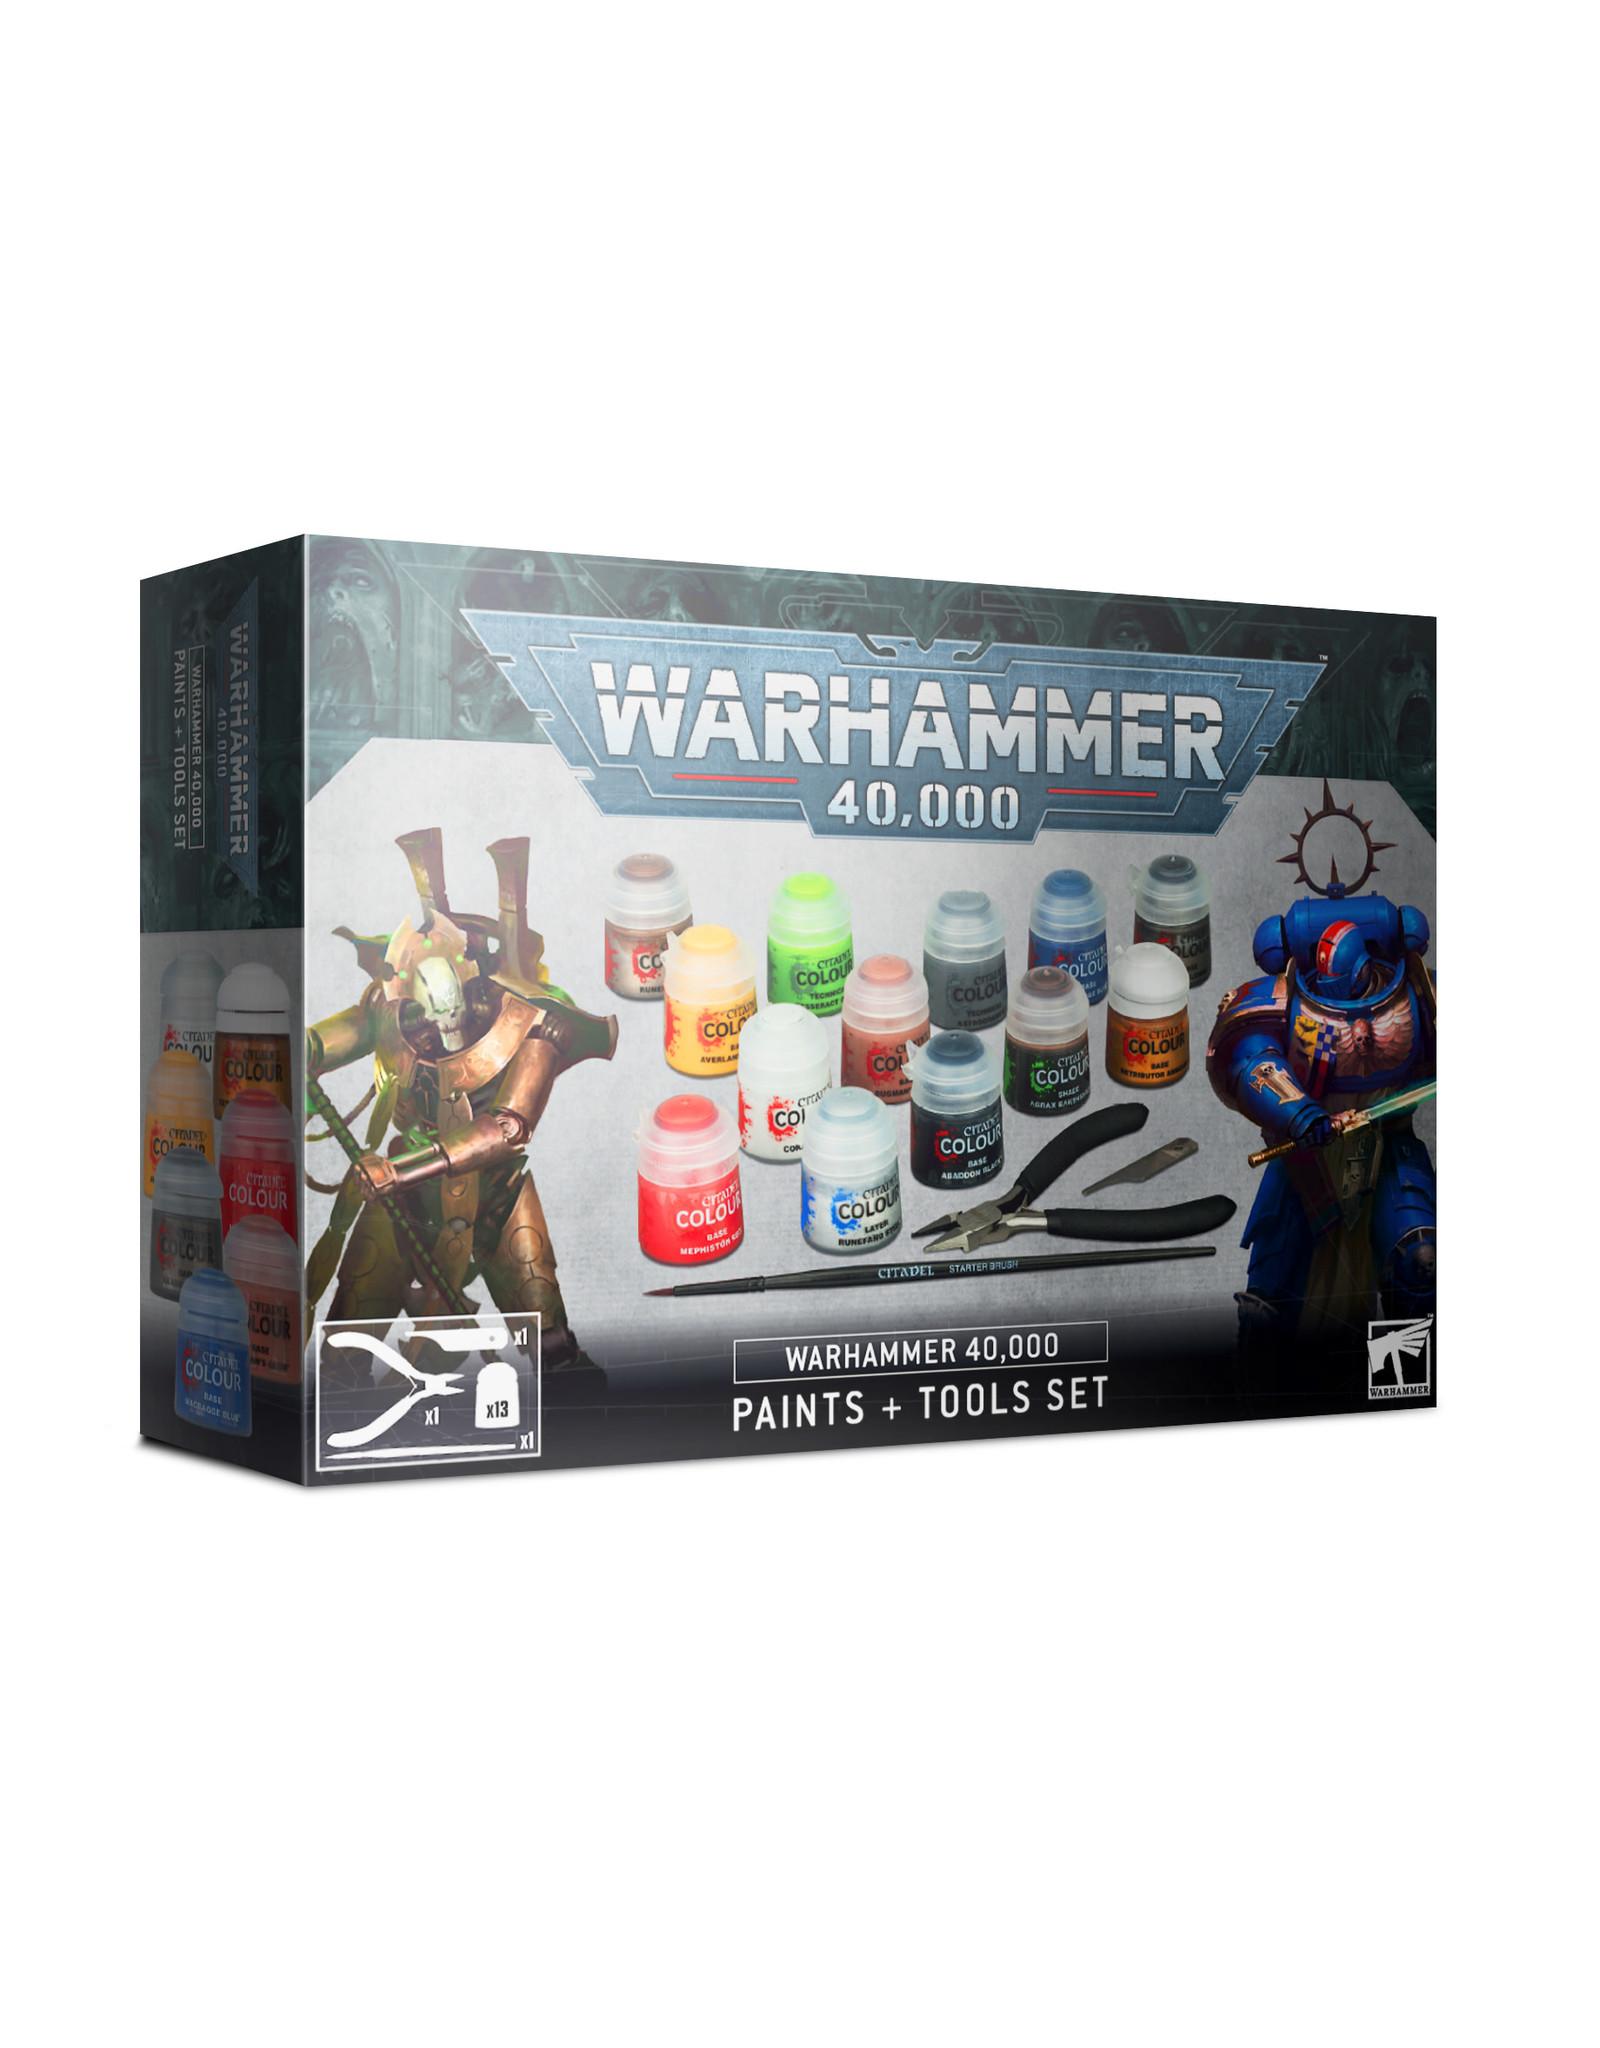 Warhammer 40,000 Warhammer 40,000: Paints + Tools Set